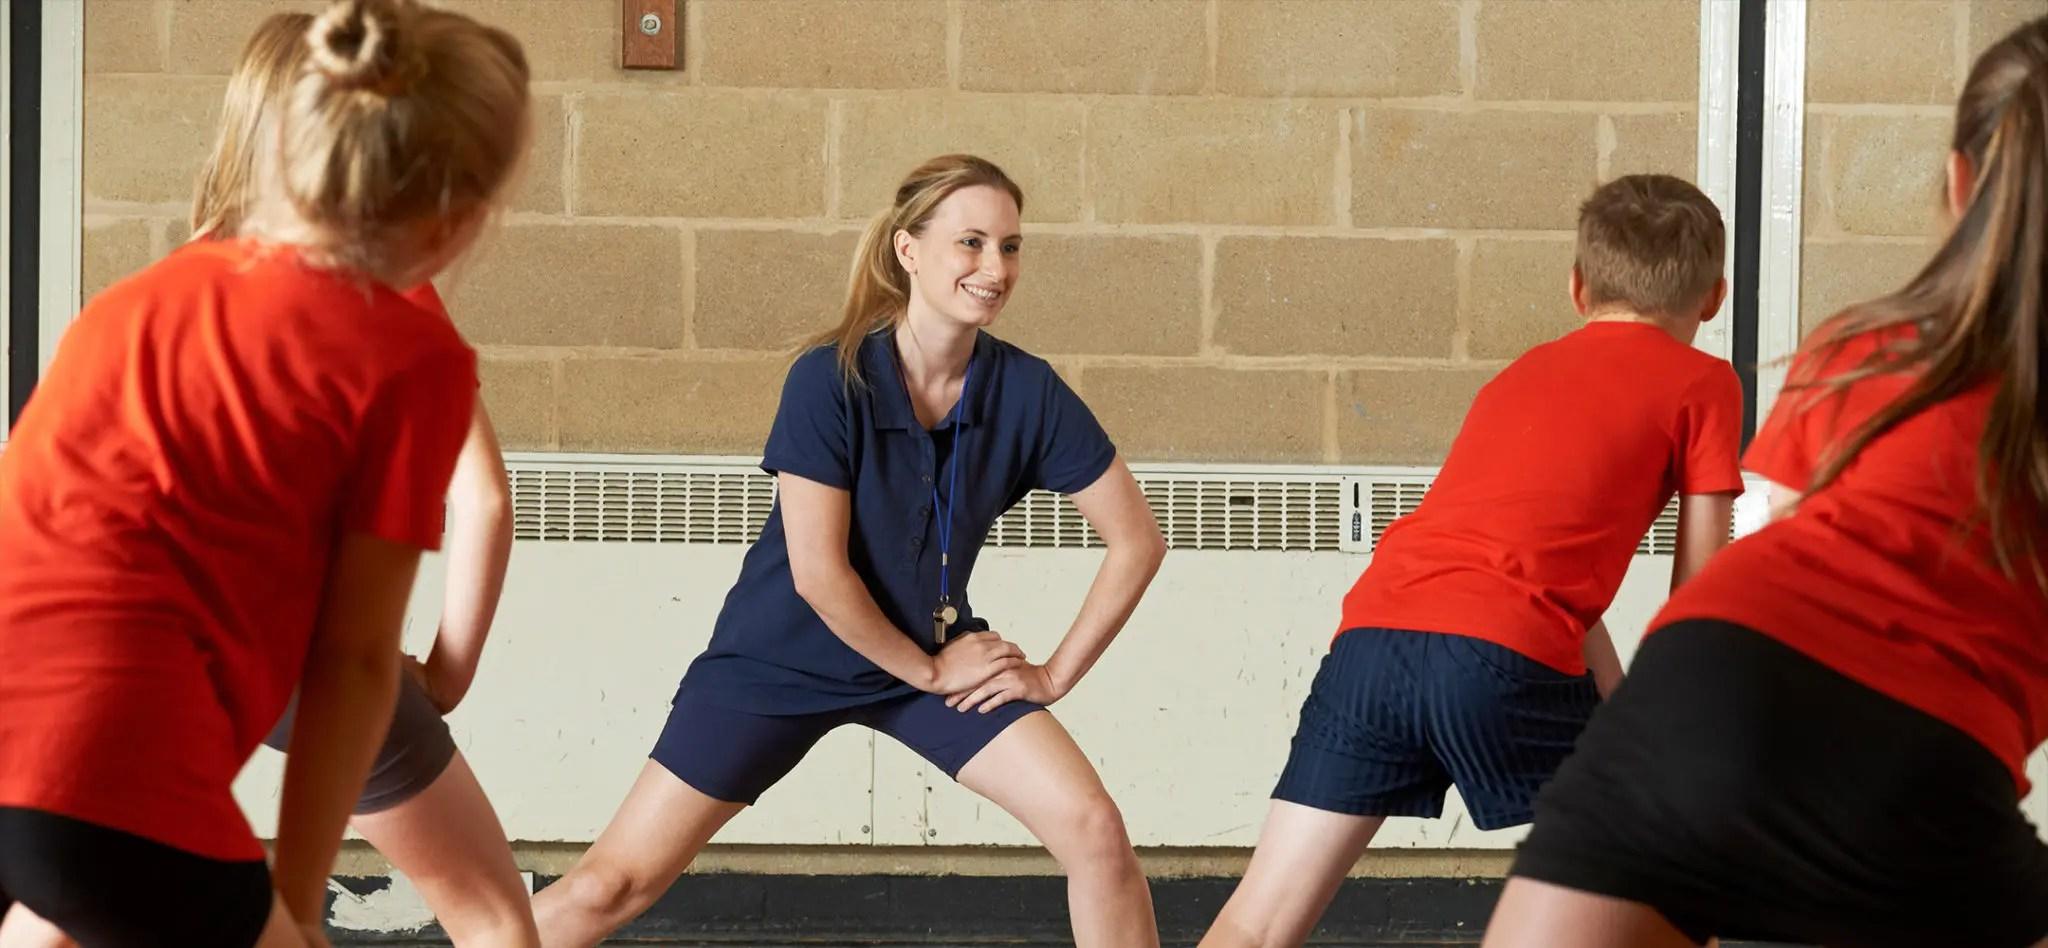 Teacher giving an exercise class in a school gym.